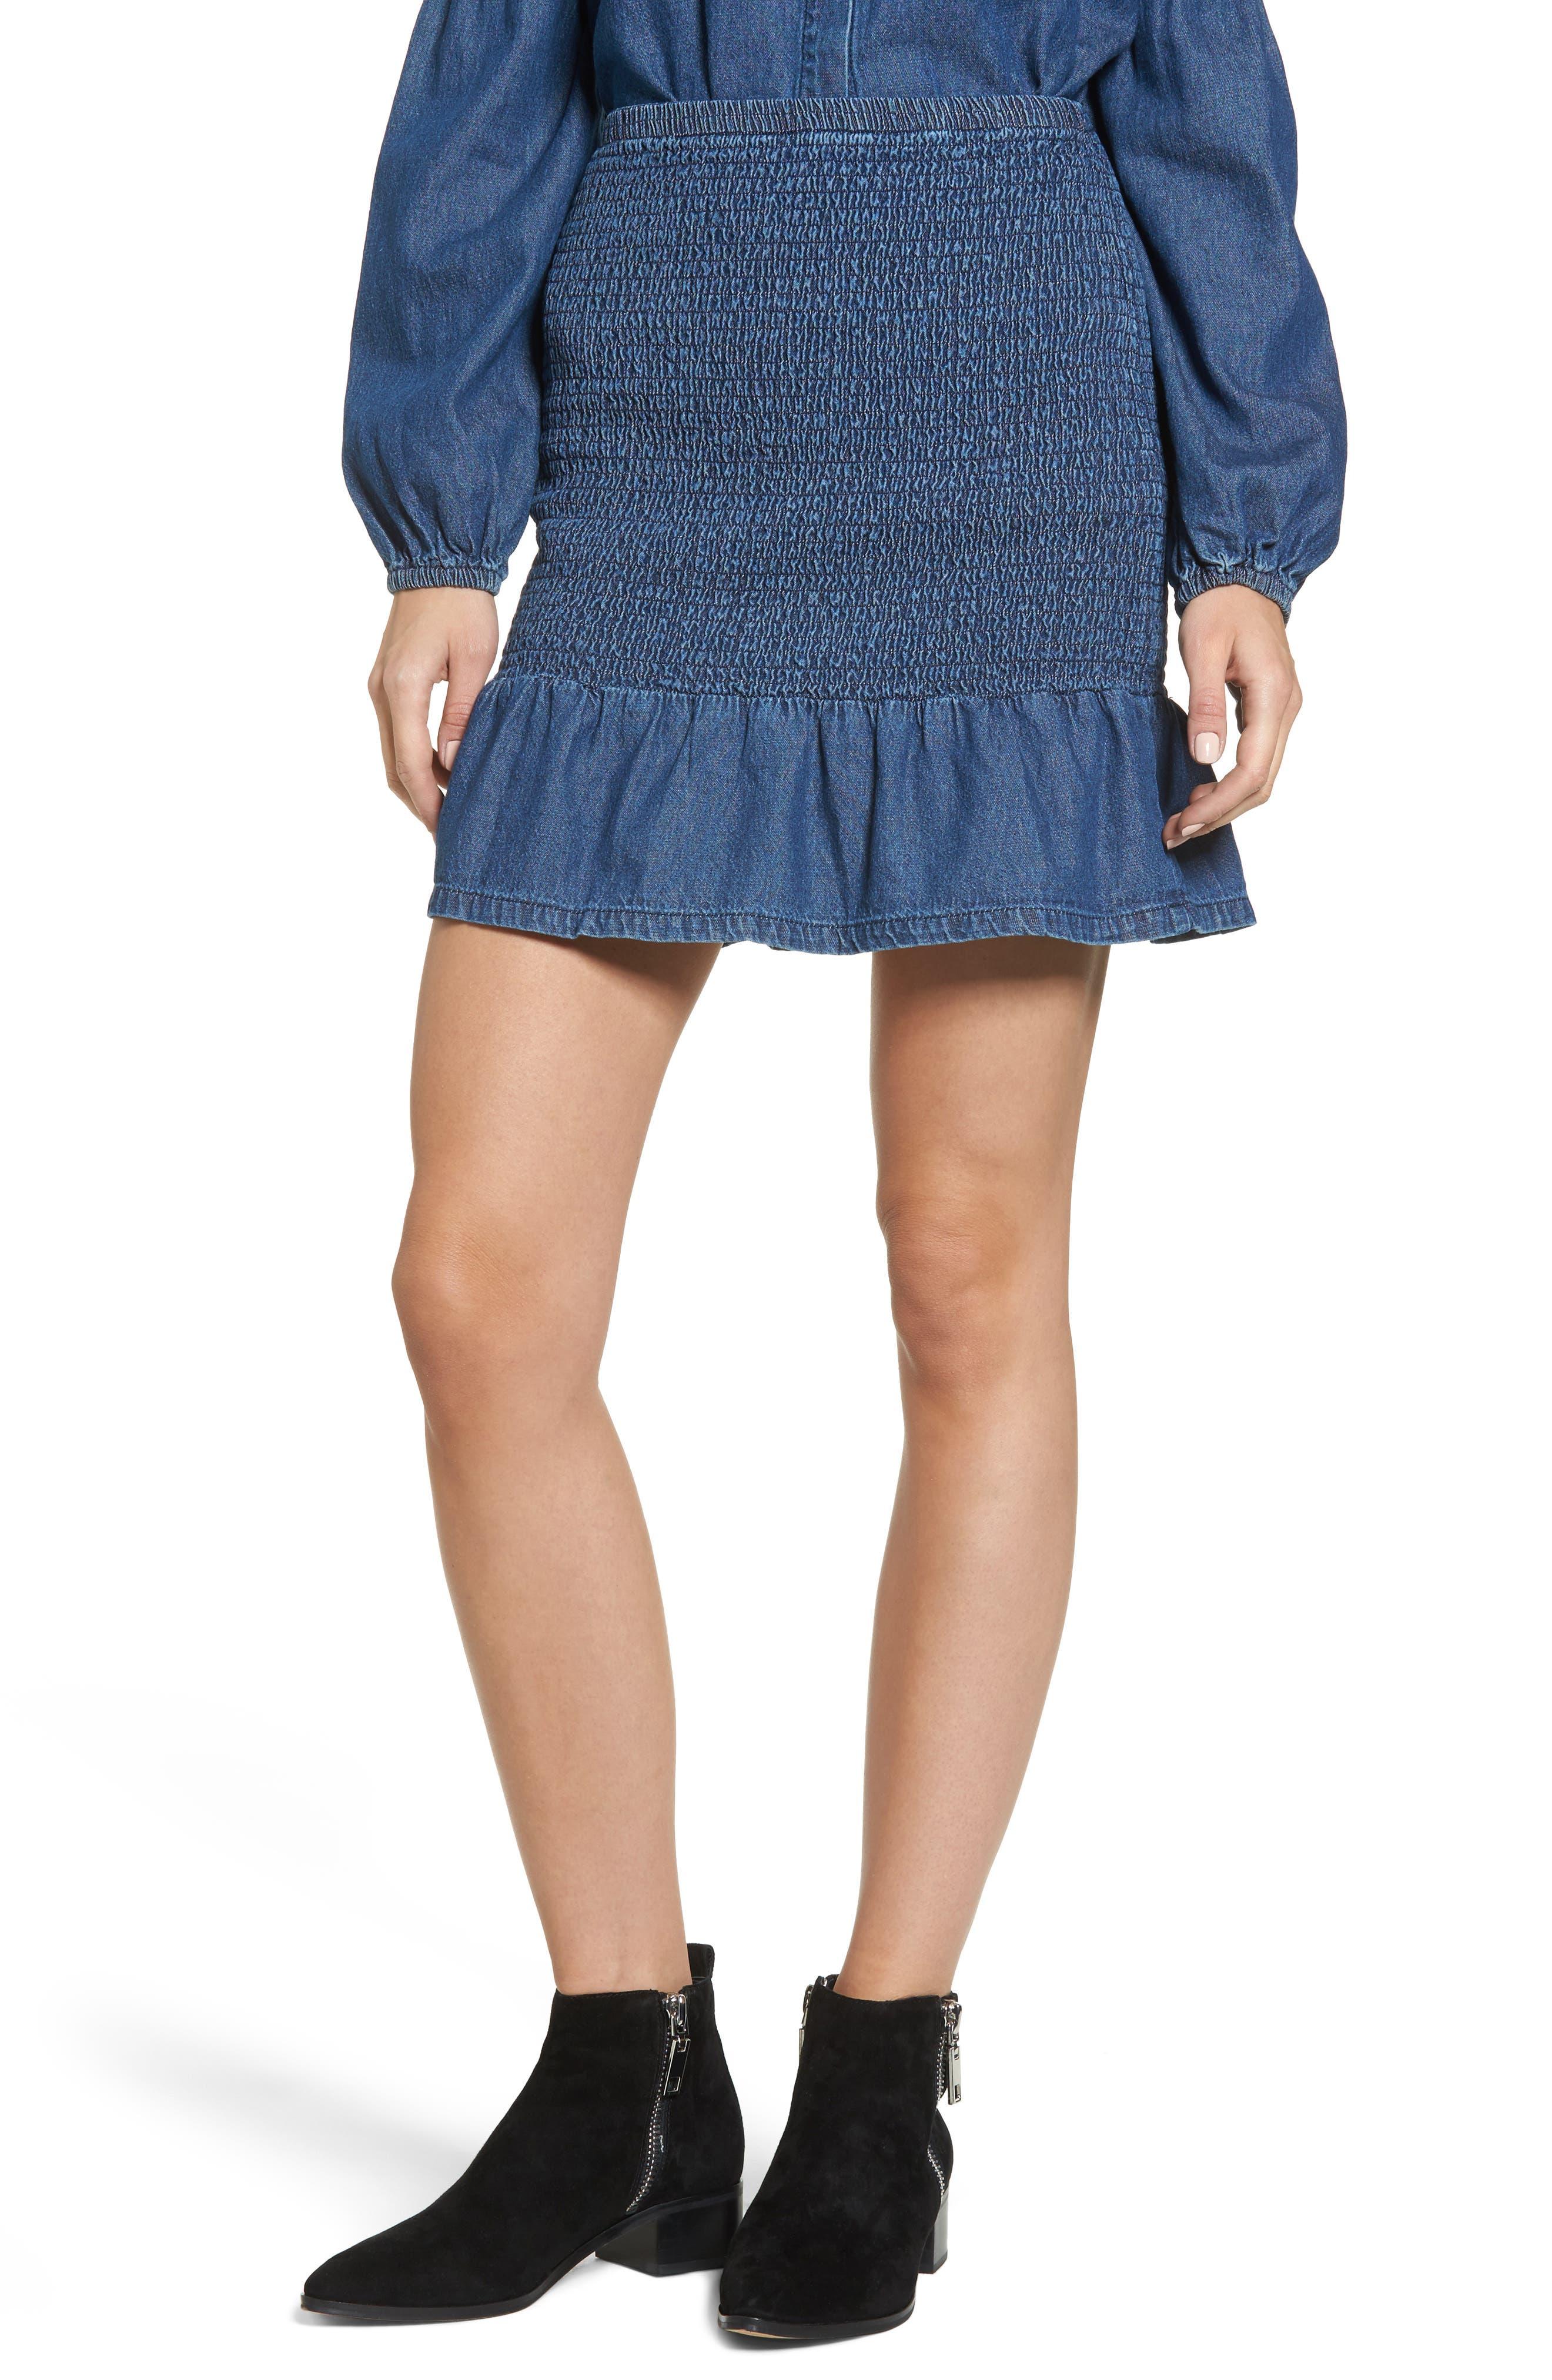 The Fifth Label Sentiment Smocked Denim Skirt